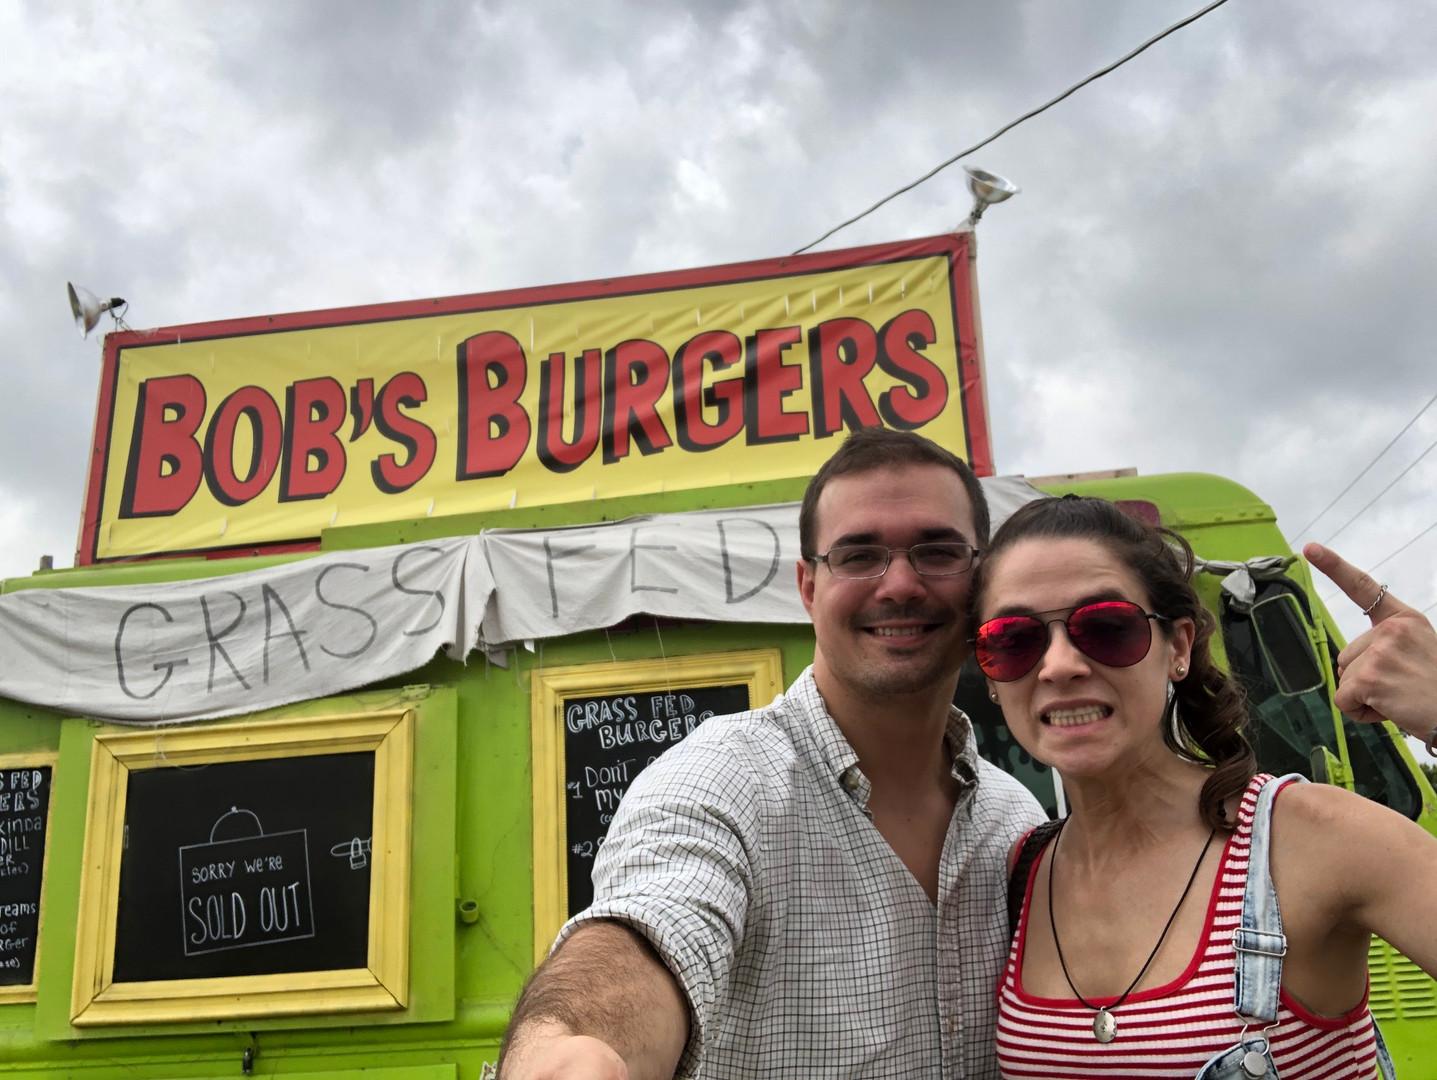 Bob's Burger's food truck in Austin